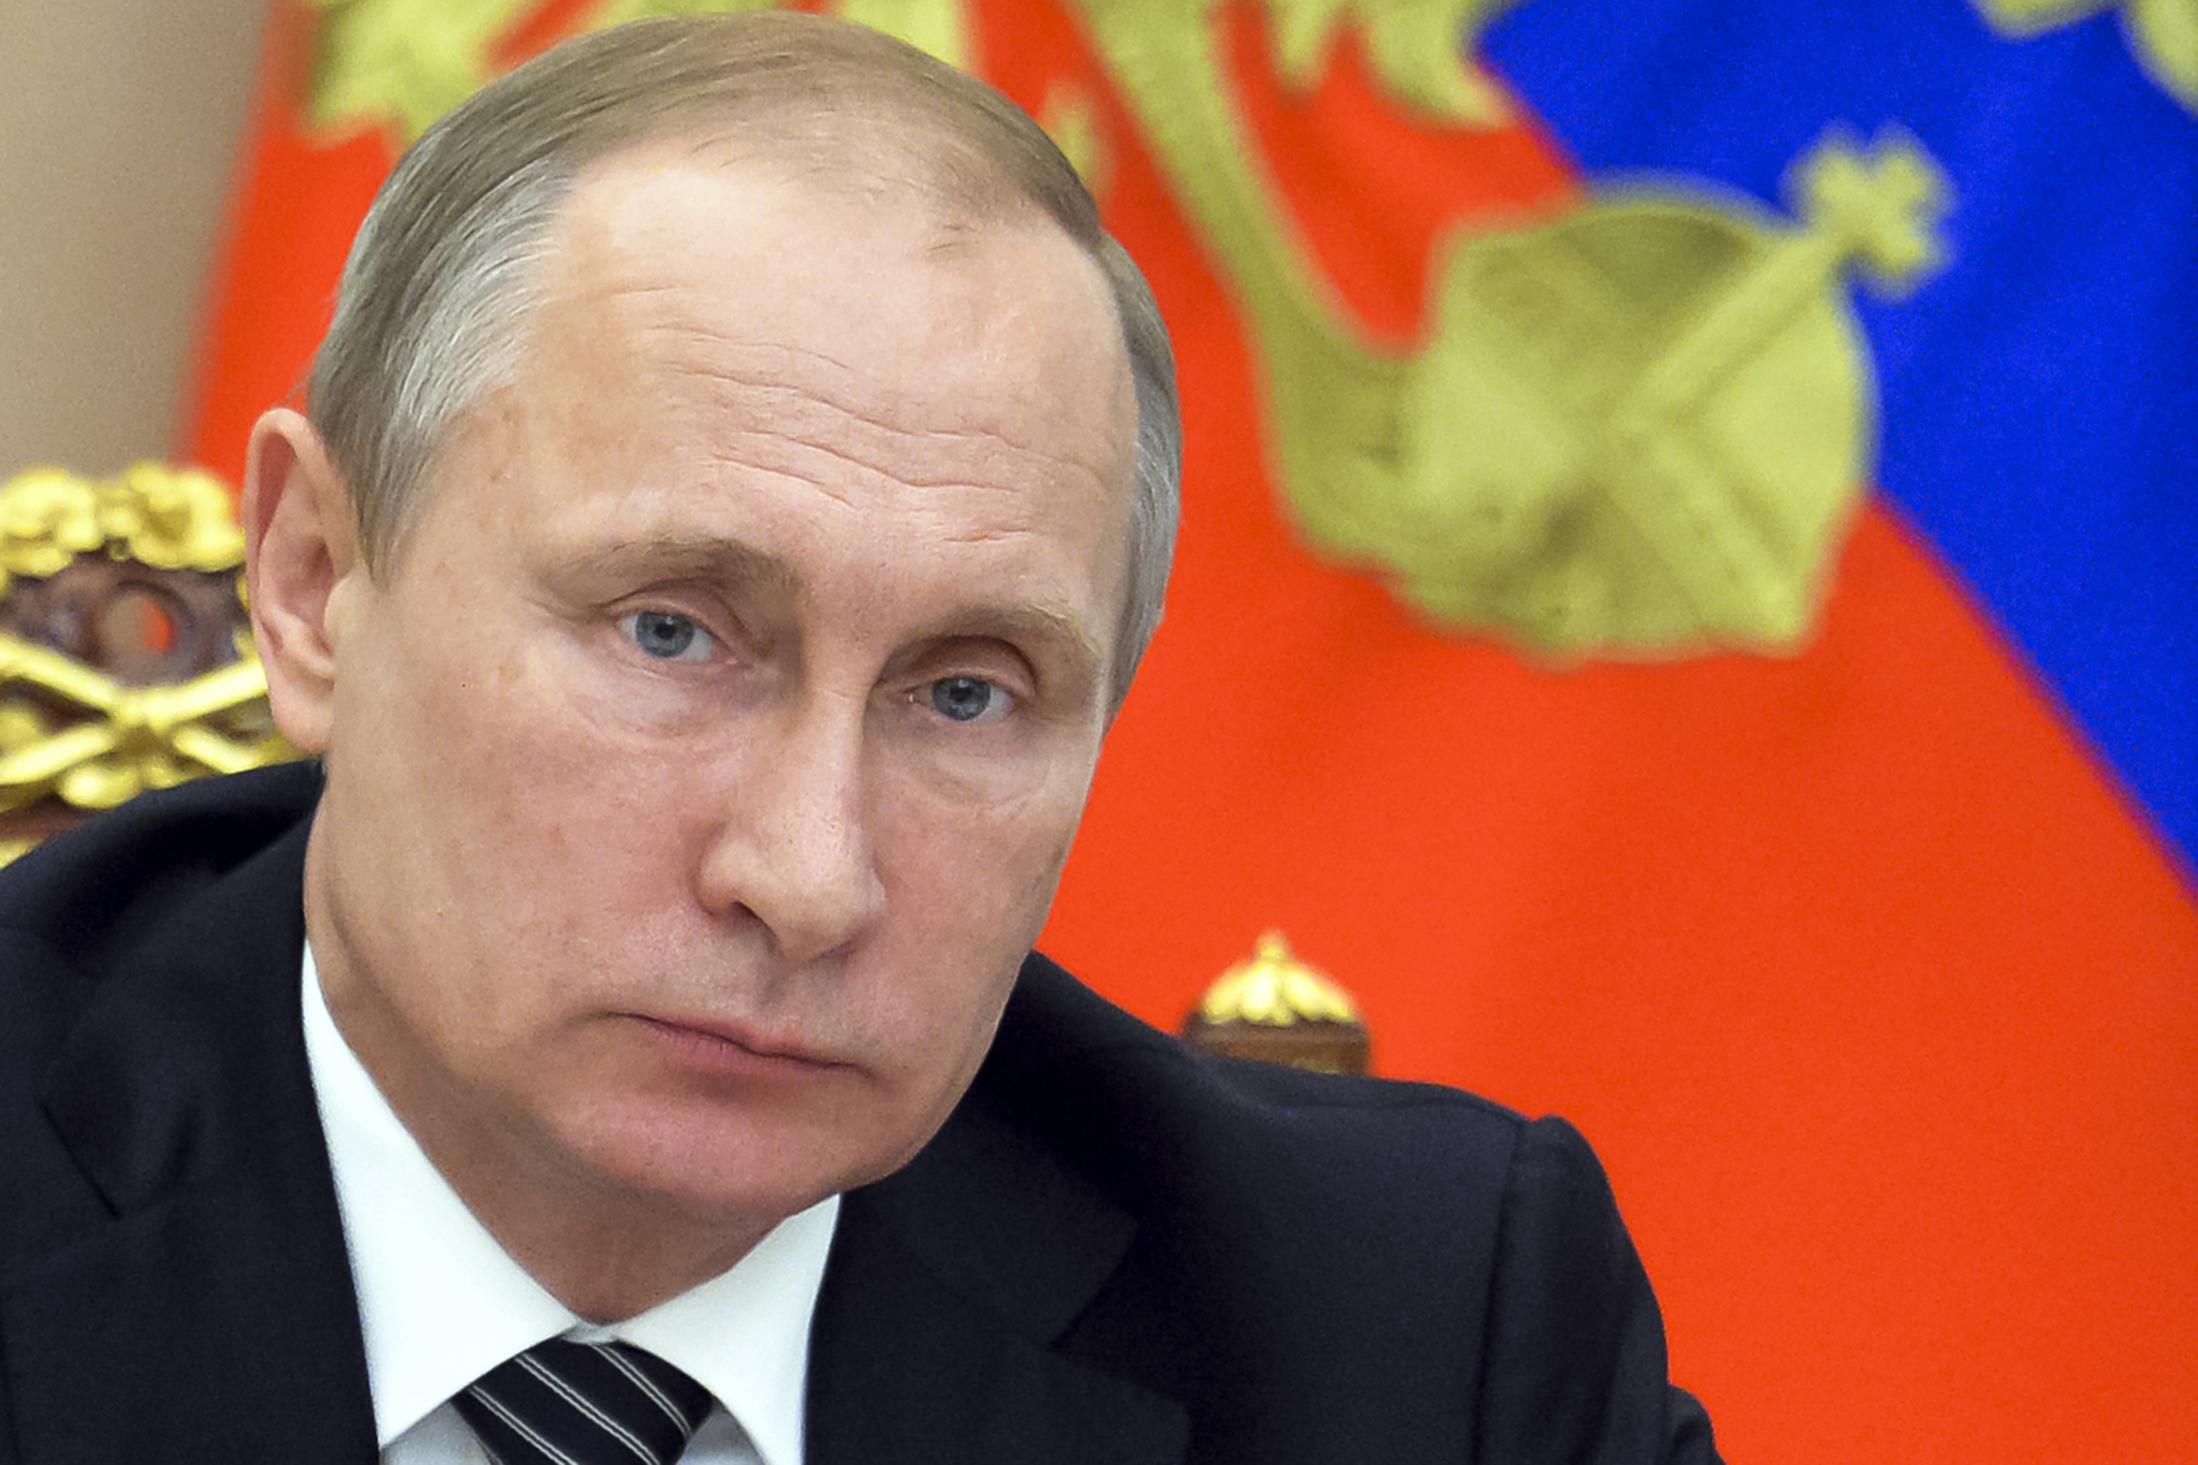 Putin durante una reunión del Gobierno. / Alexei Druzhinin/Sputnik, Kremlin Pool Photo via AP